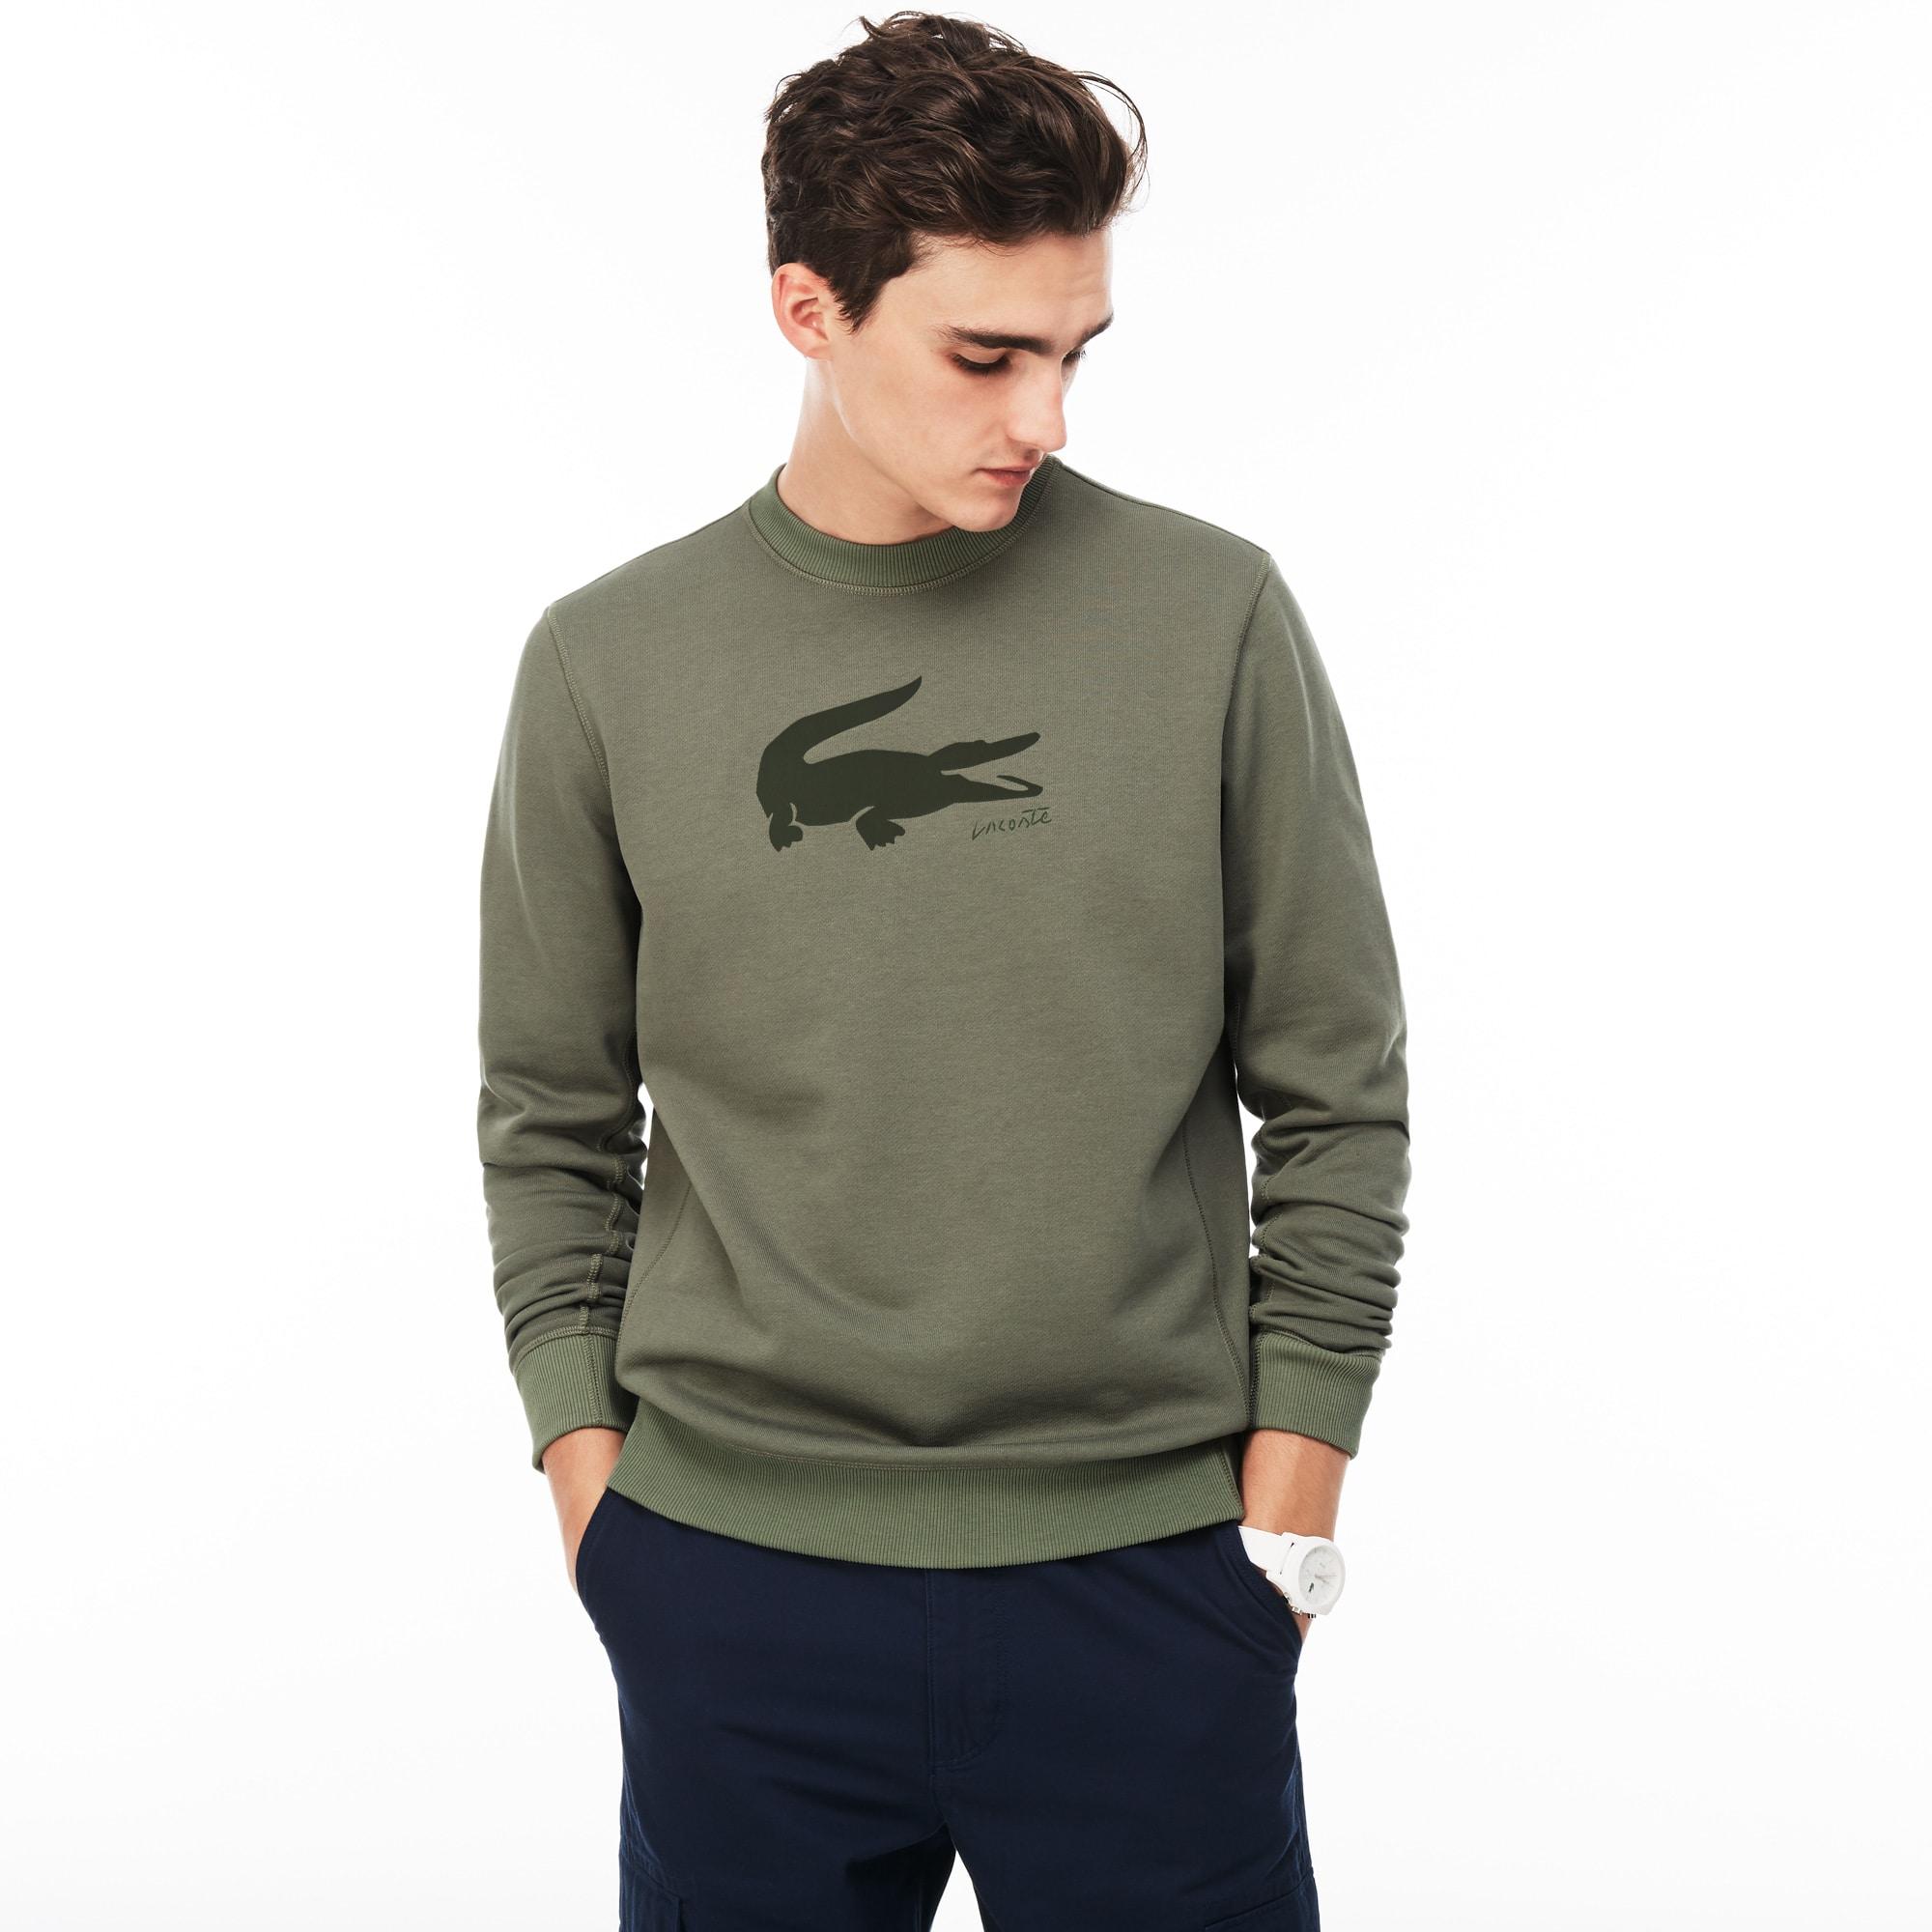 Men's Crocodile Print Sweatshirt